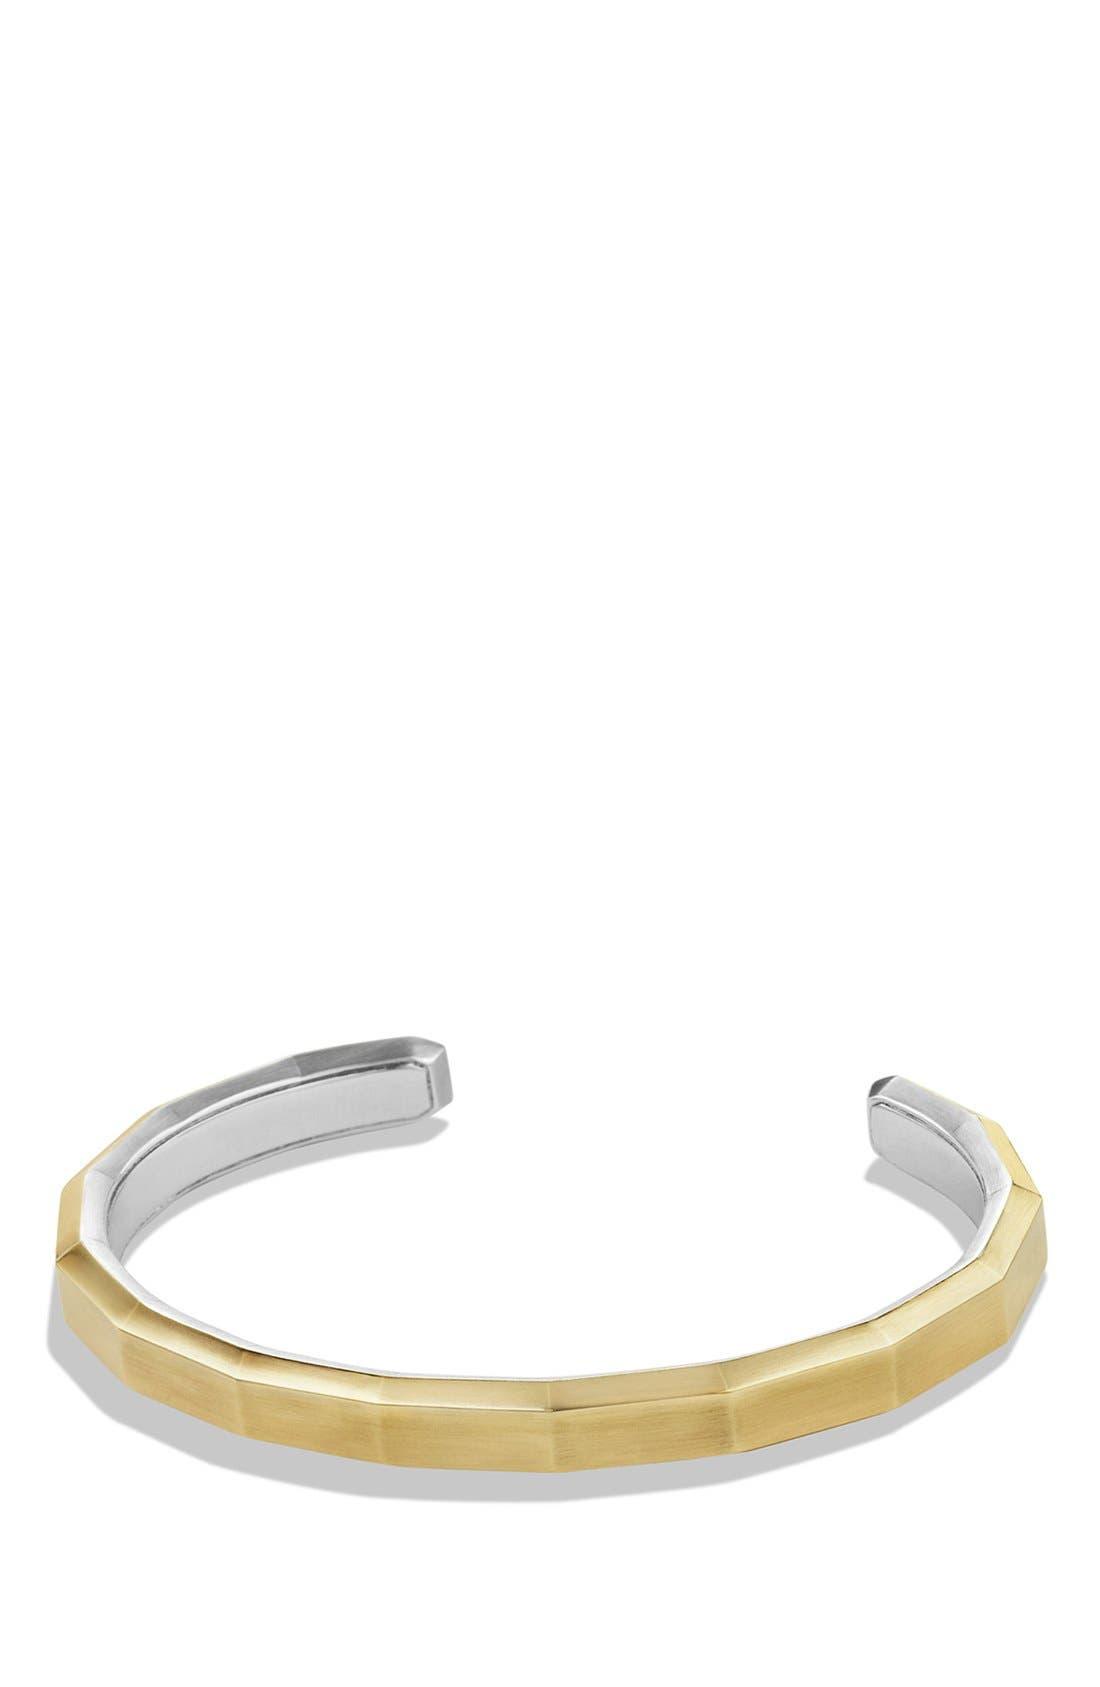 DAVID YURMAN 'Faceted Metal' Cuff Bracelet with 18k